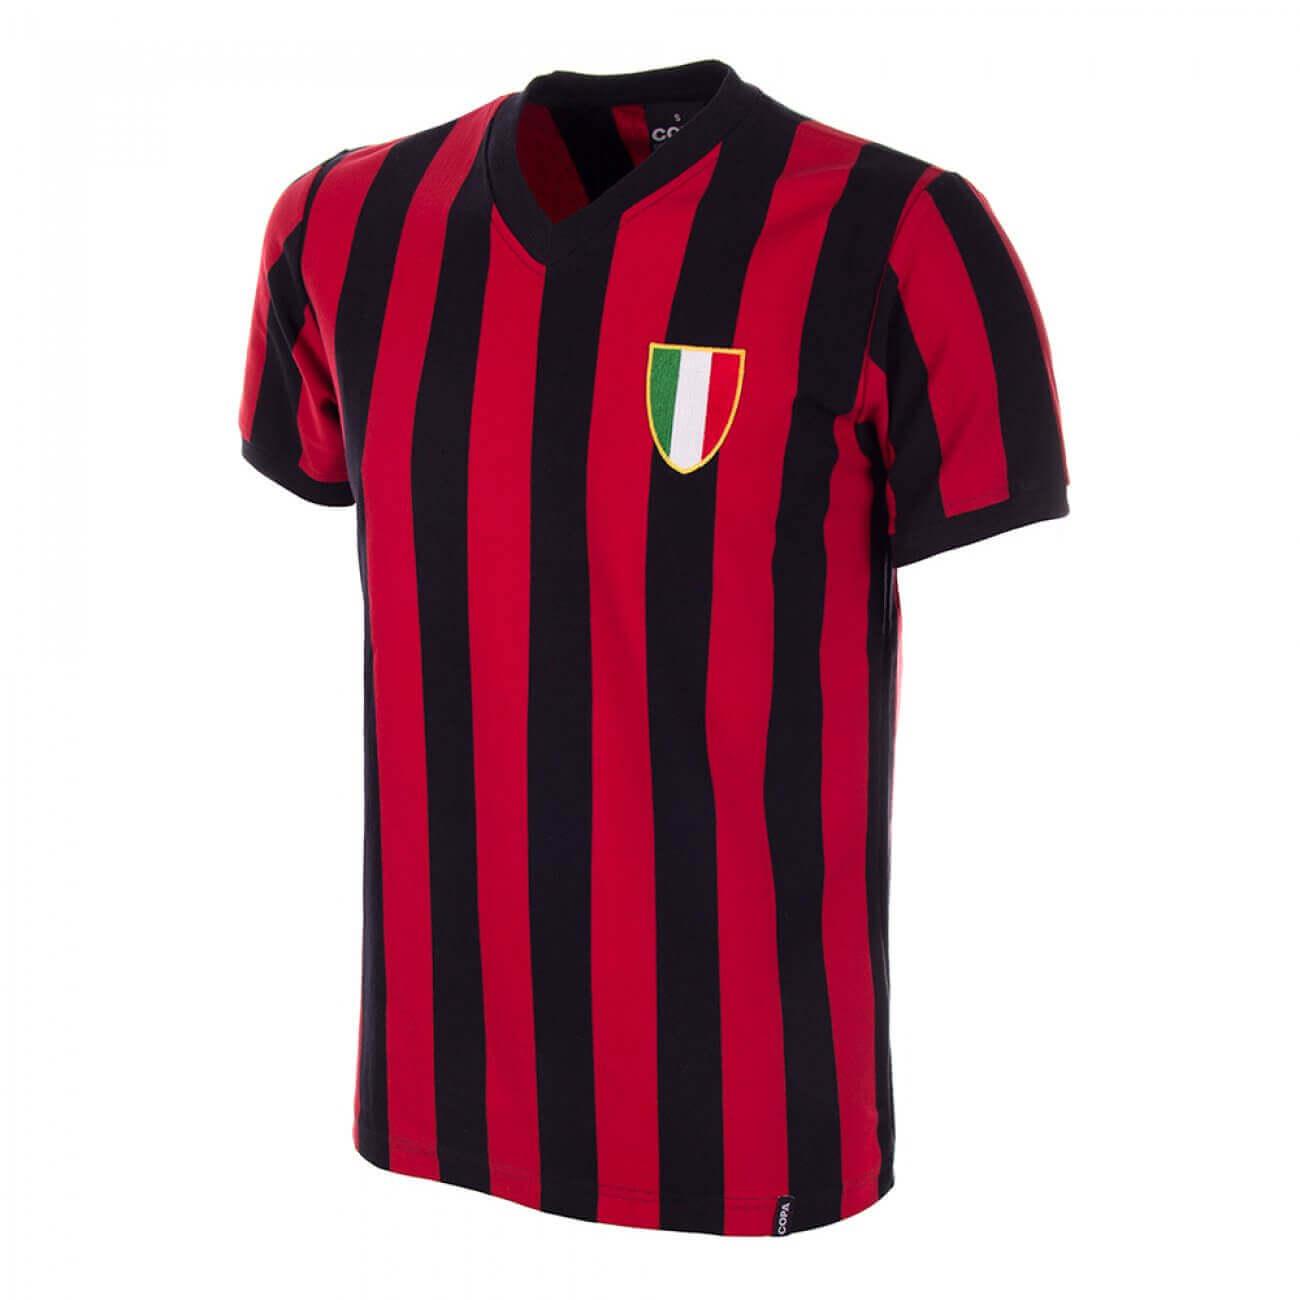 Camiseta AC Milan años 60